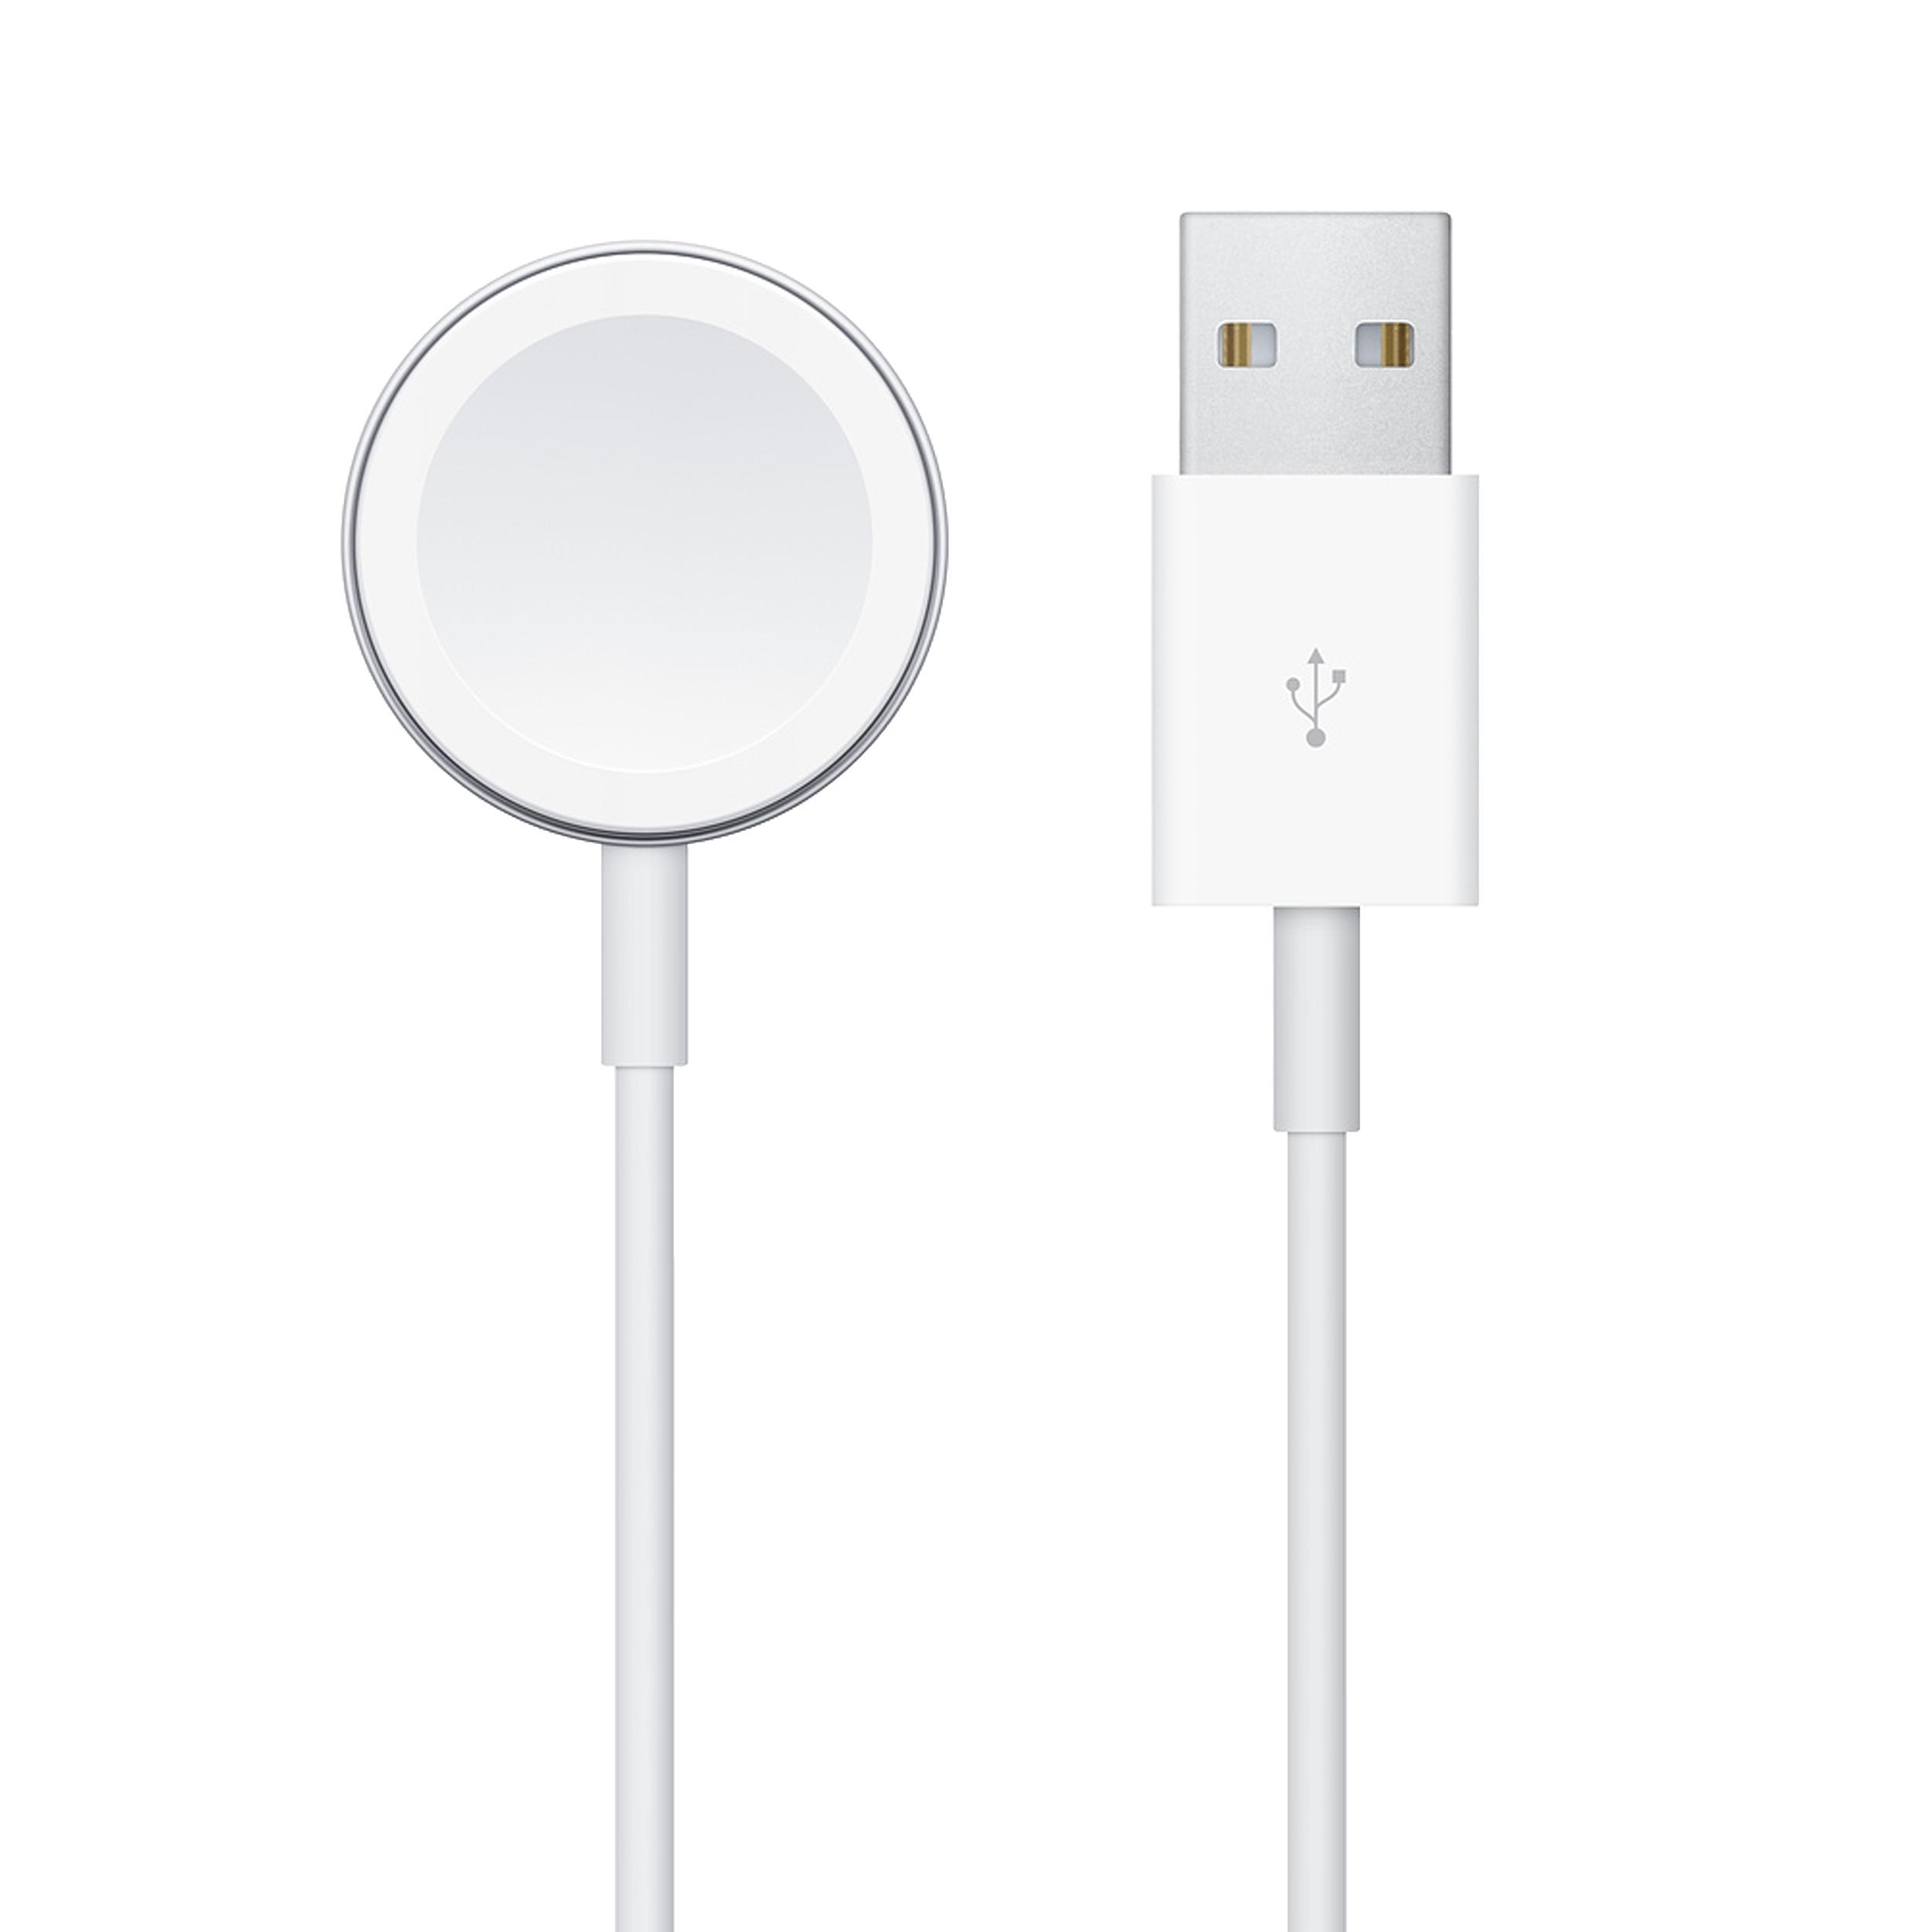 کابل شارژ اپل مدل MX2F2AM مناسب برای ساعت هوشمند اپل Apple Watch 1 to 5 Series